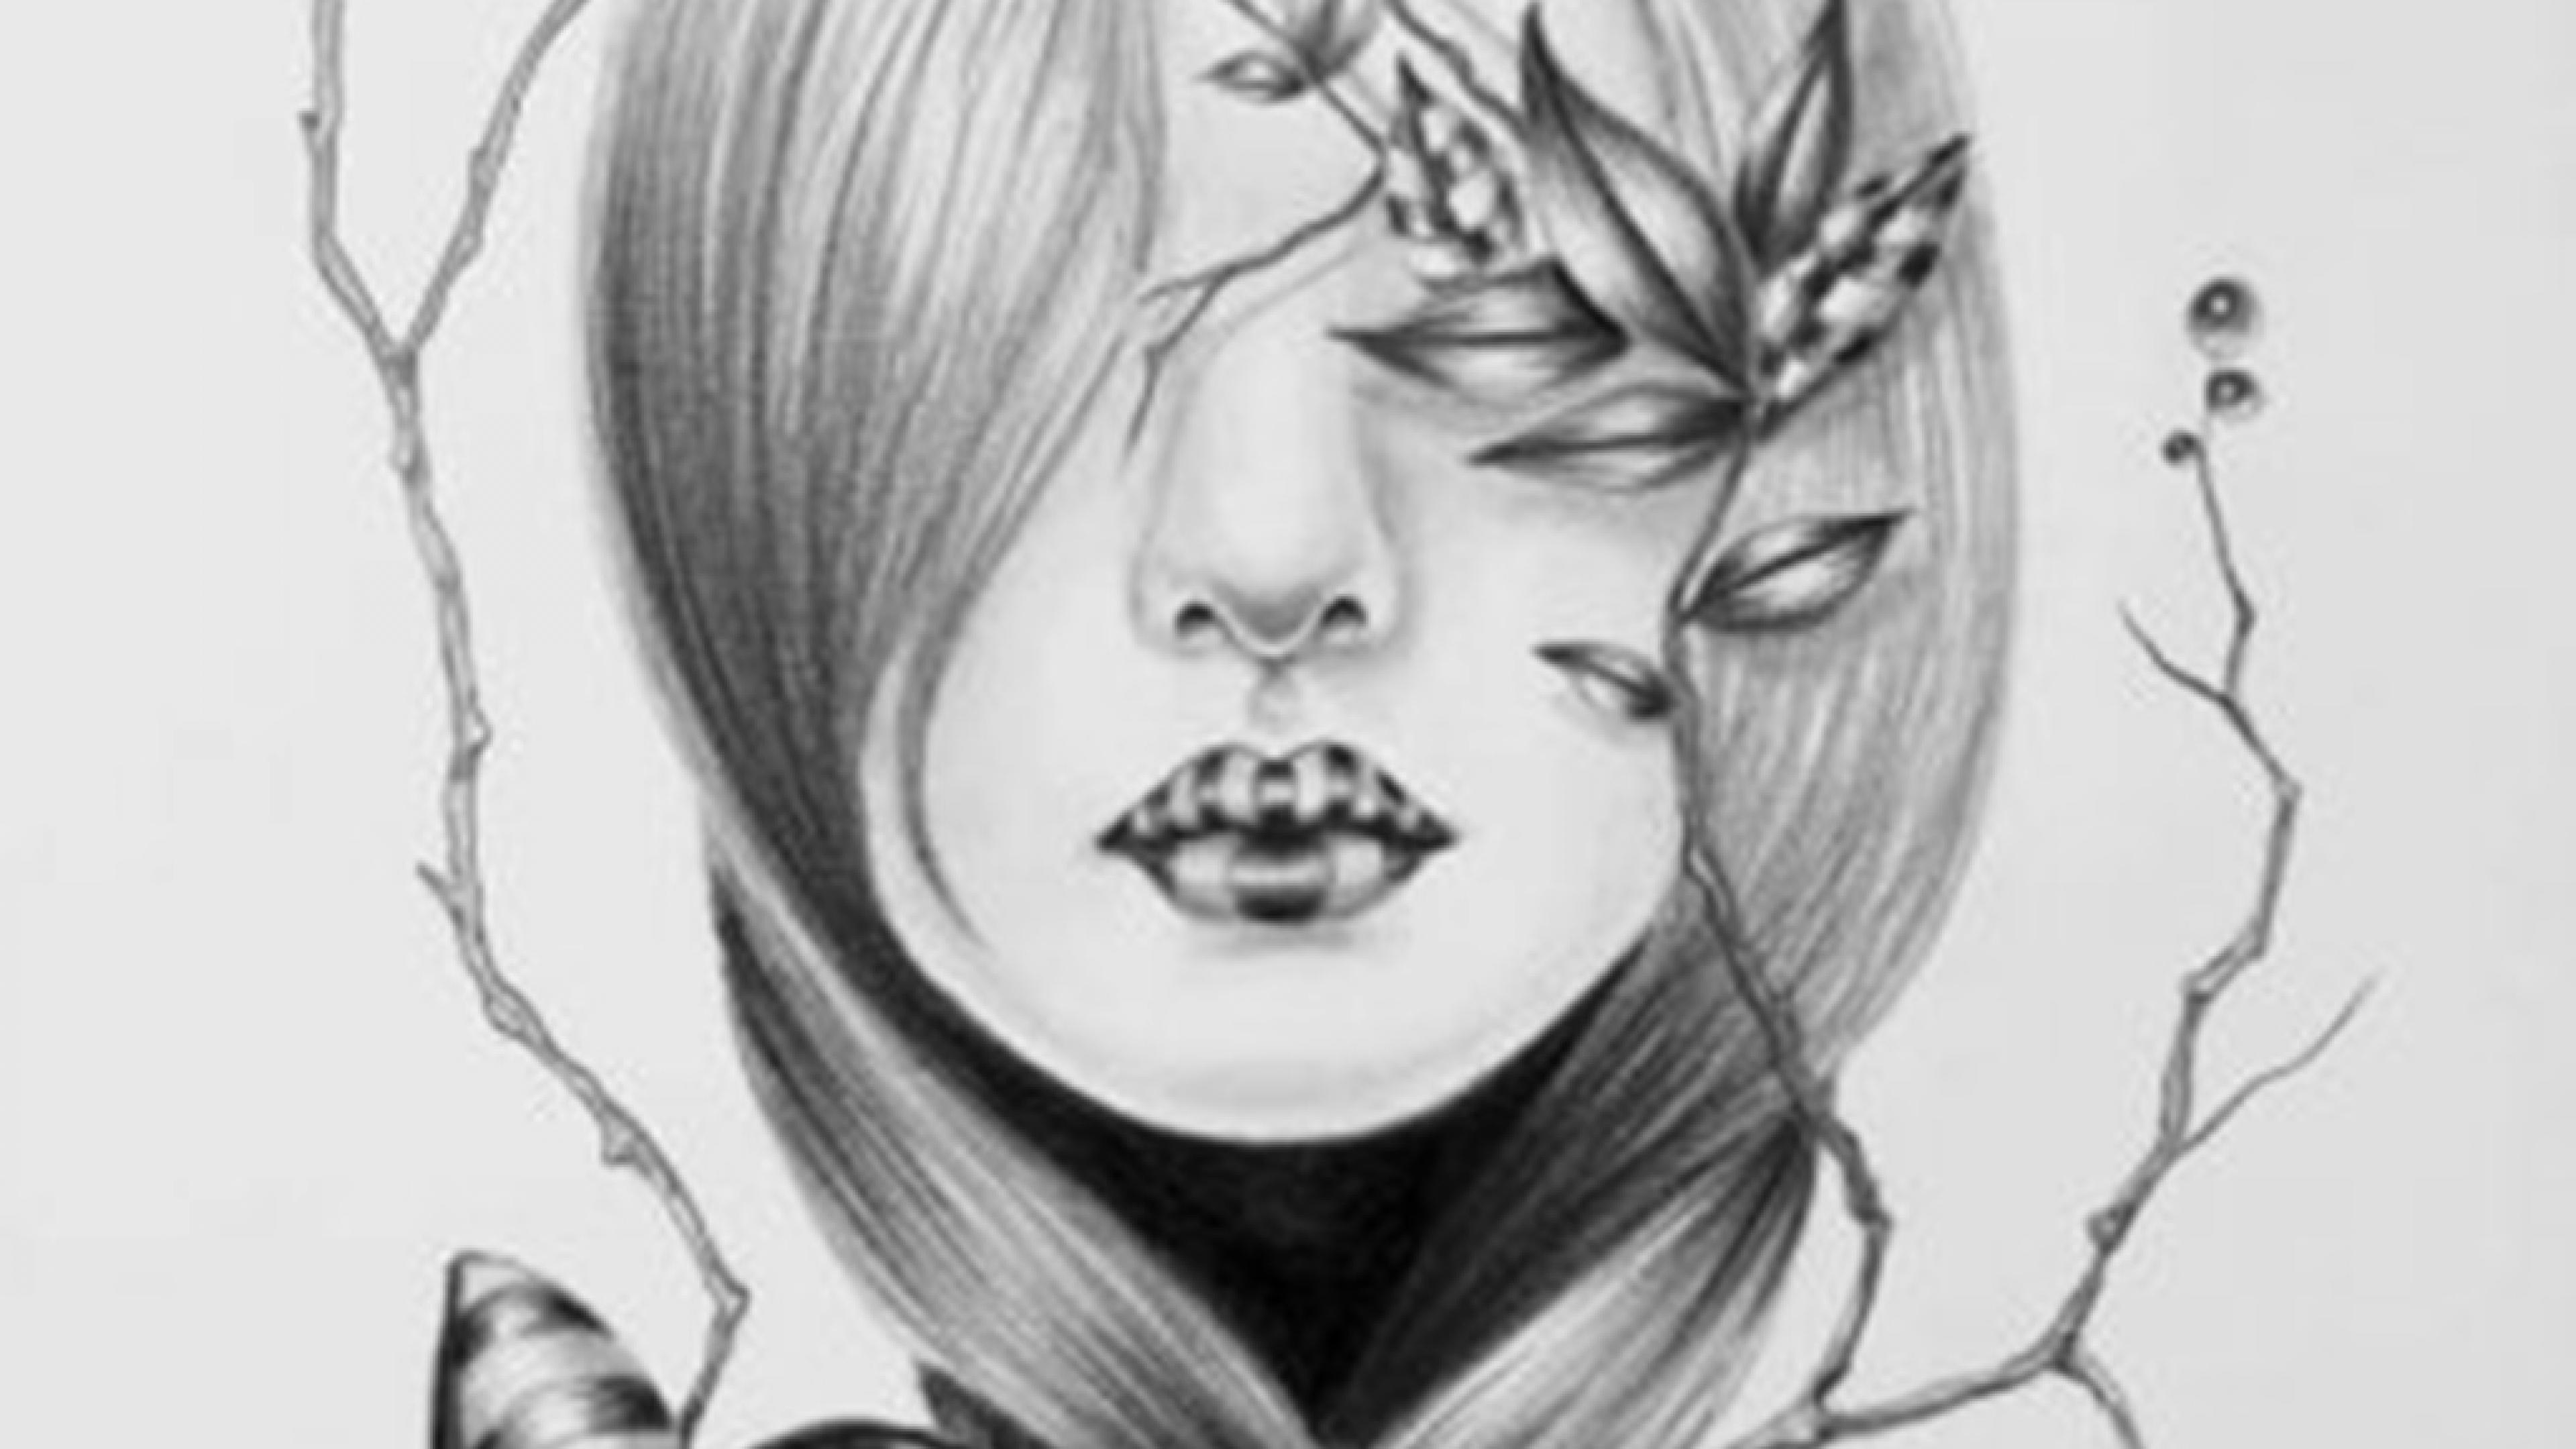 Pencil Art Wallpaper 48 Pictures